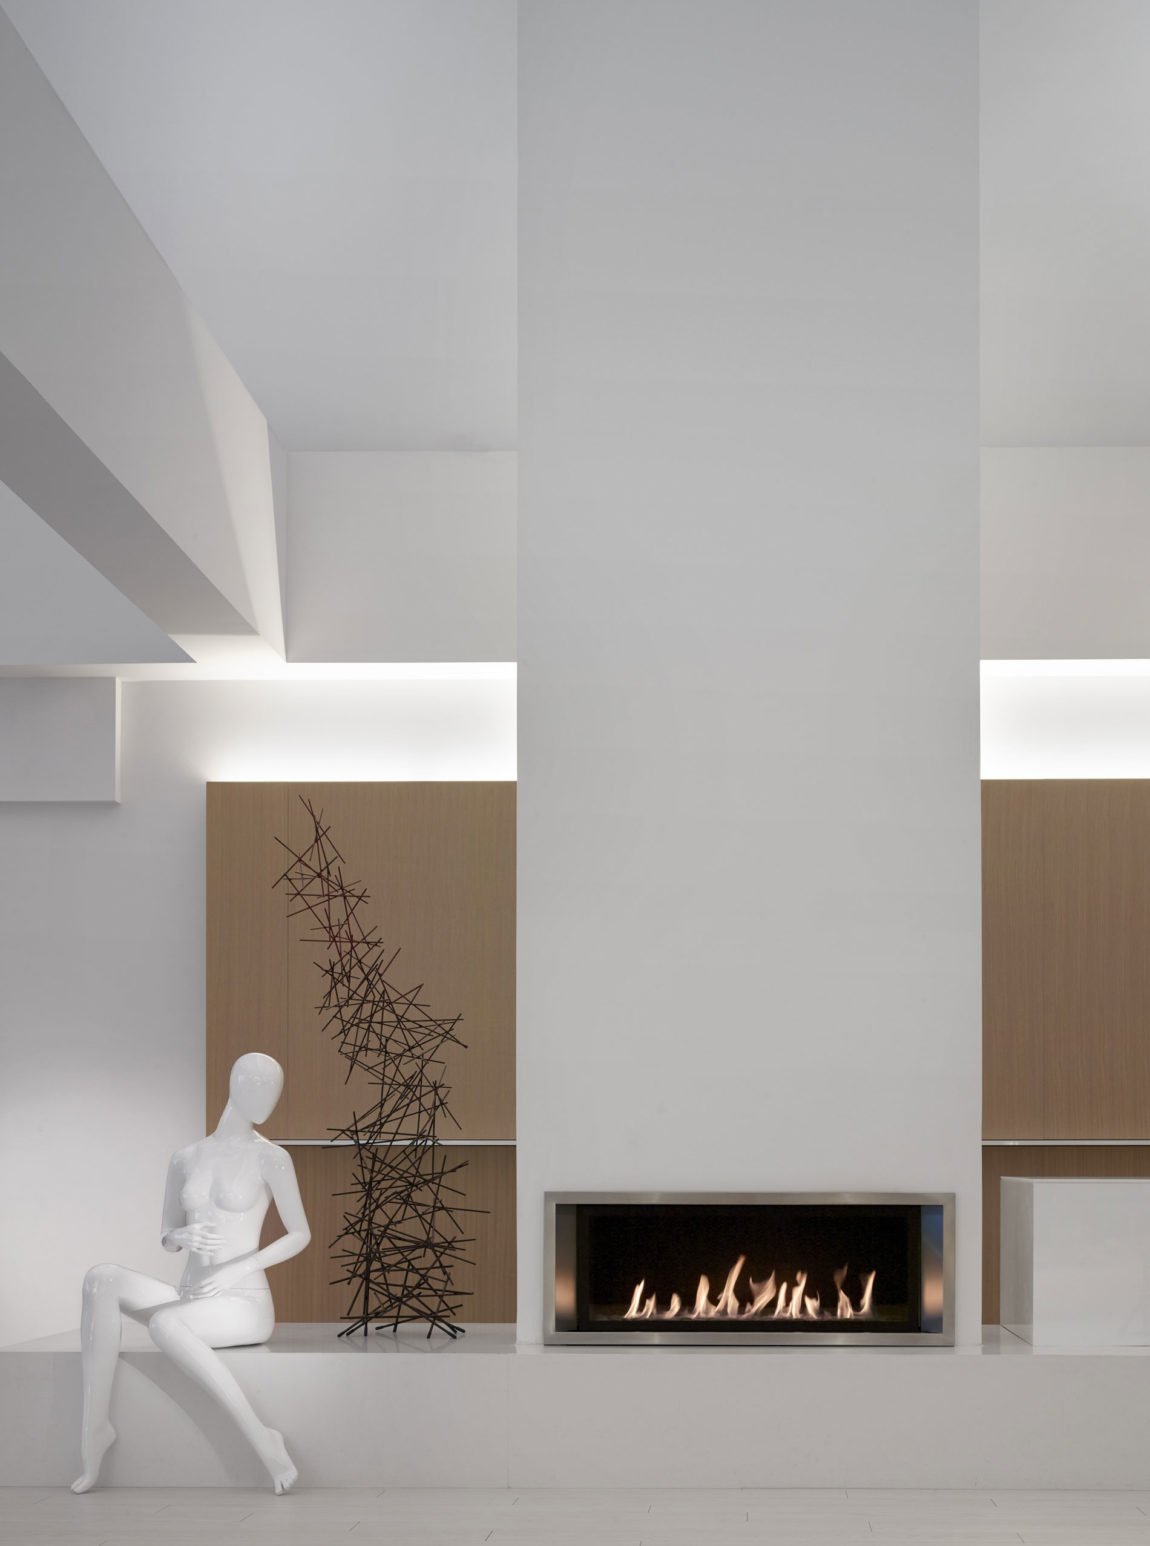 Art Shoppe Lofts + Condos by Cecconi Simone (5)